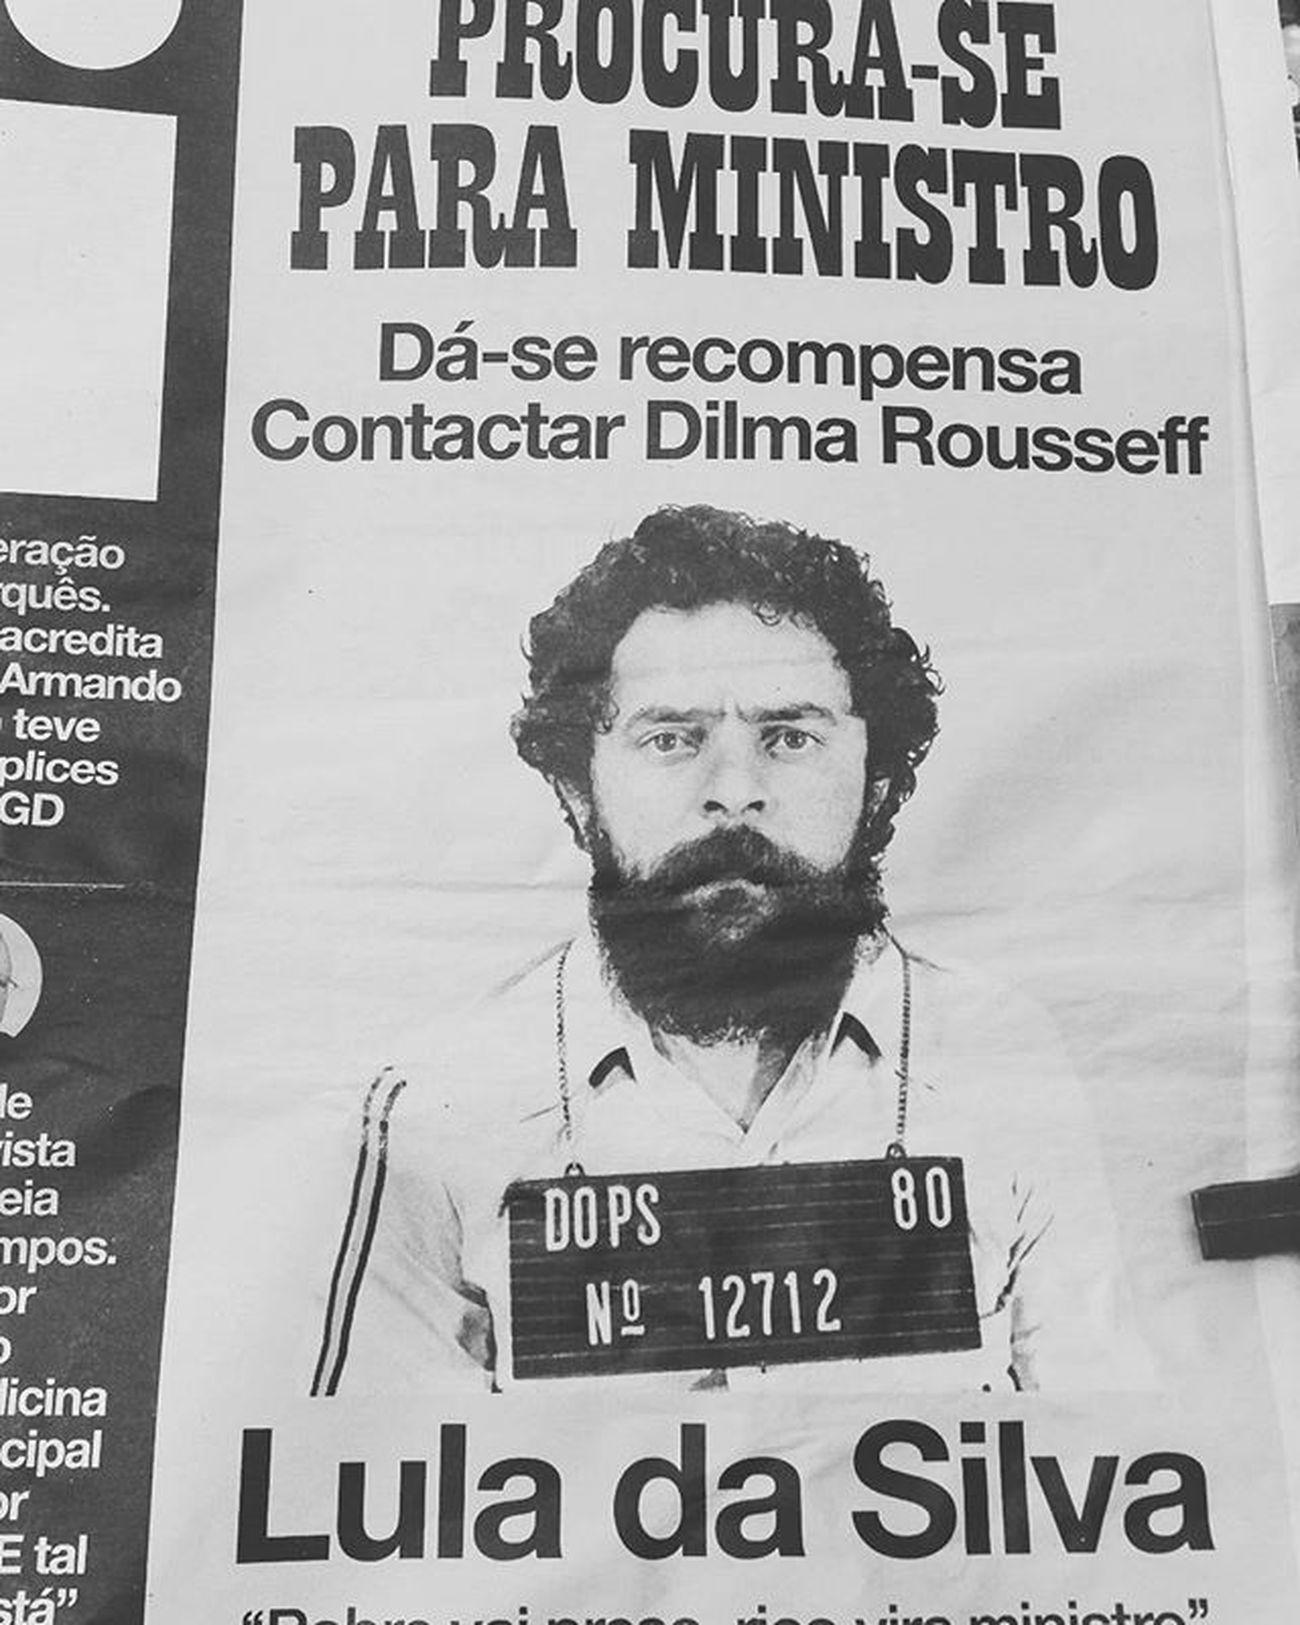 Brasil Corrupção Jornal em Portugal Portugal Lisboa Lisbon Lula Lavaajato Bandido Corrupto